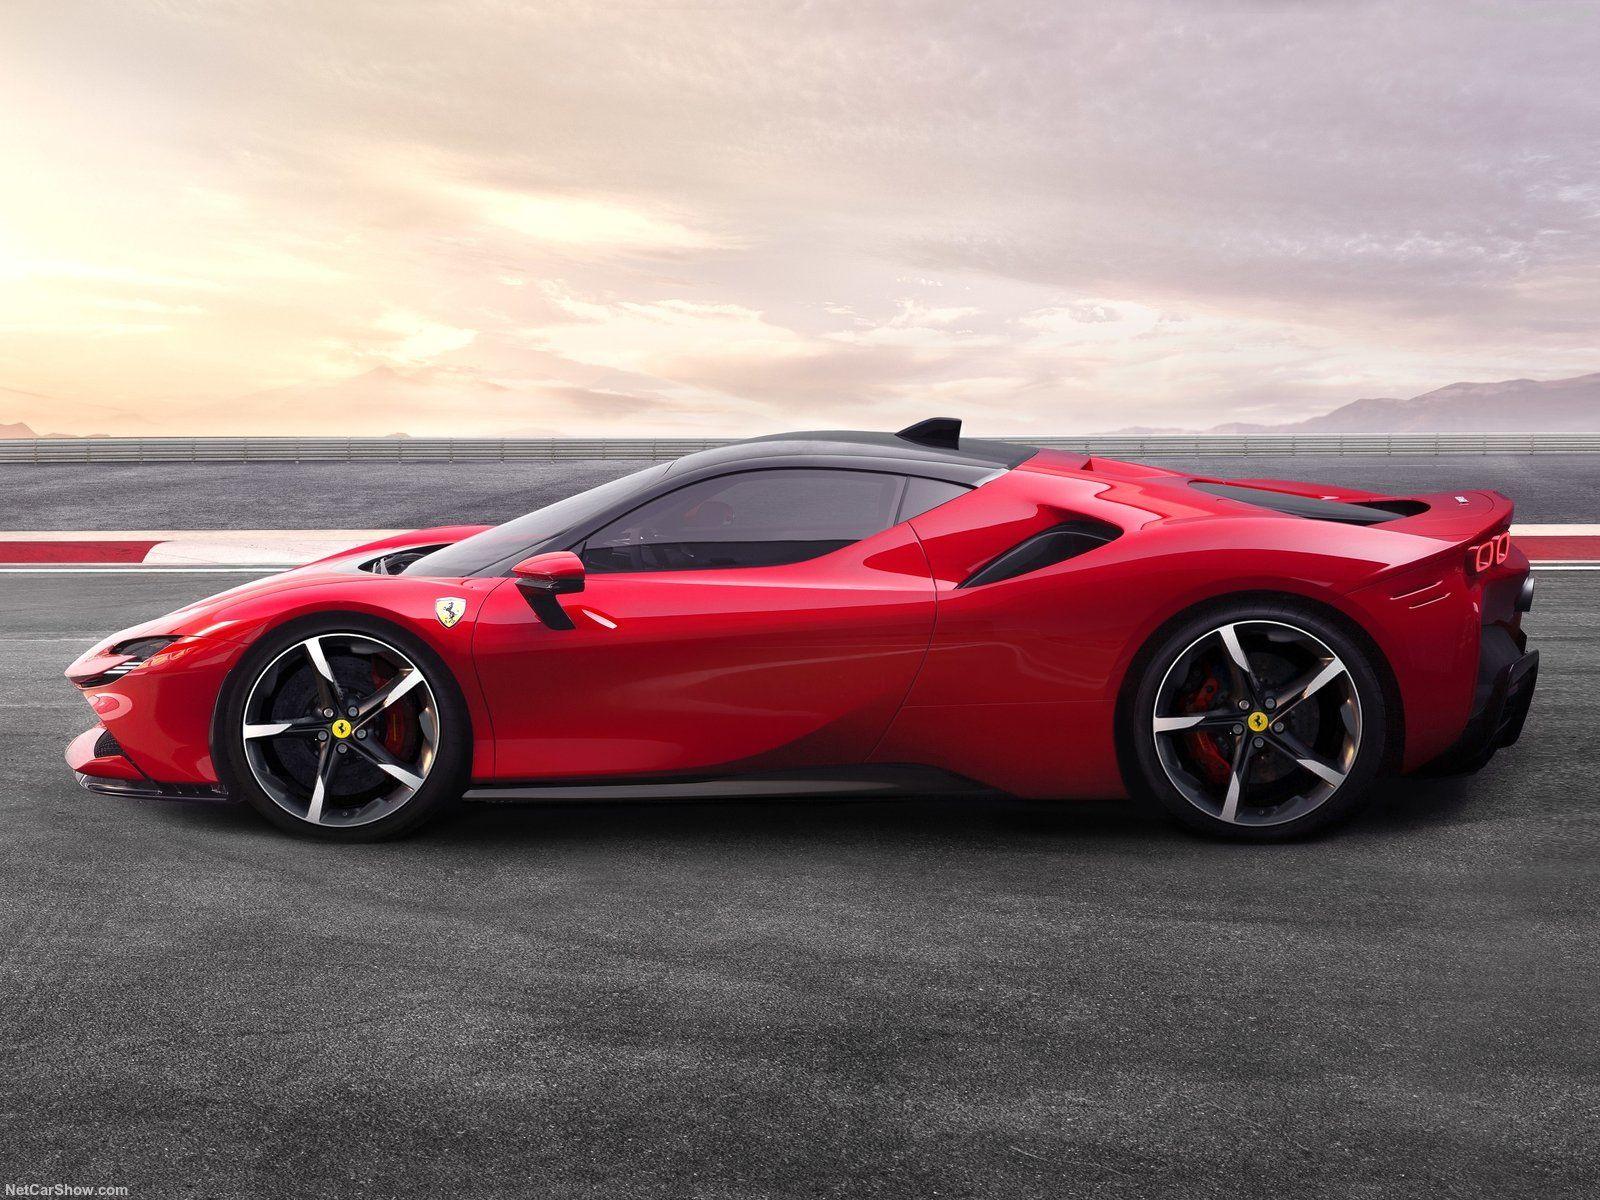 Ferrari Sf90 Stradale Super Cars Hybrid Car Cool Sports Cars